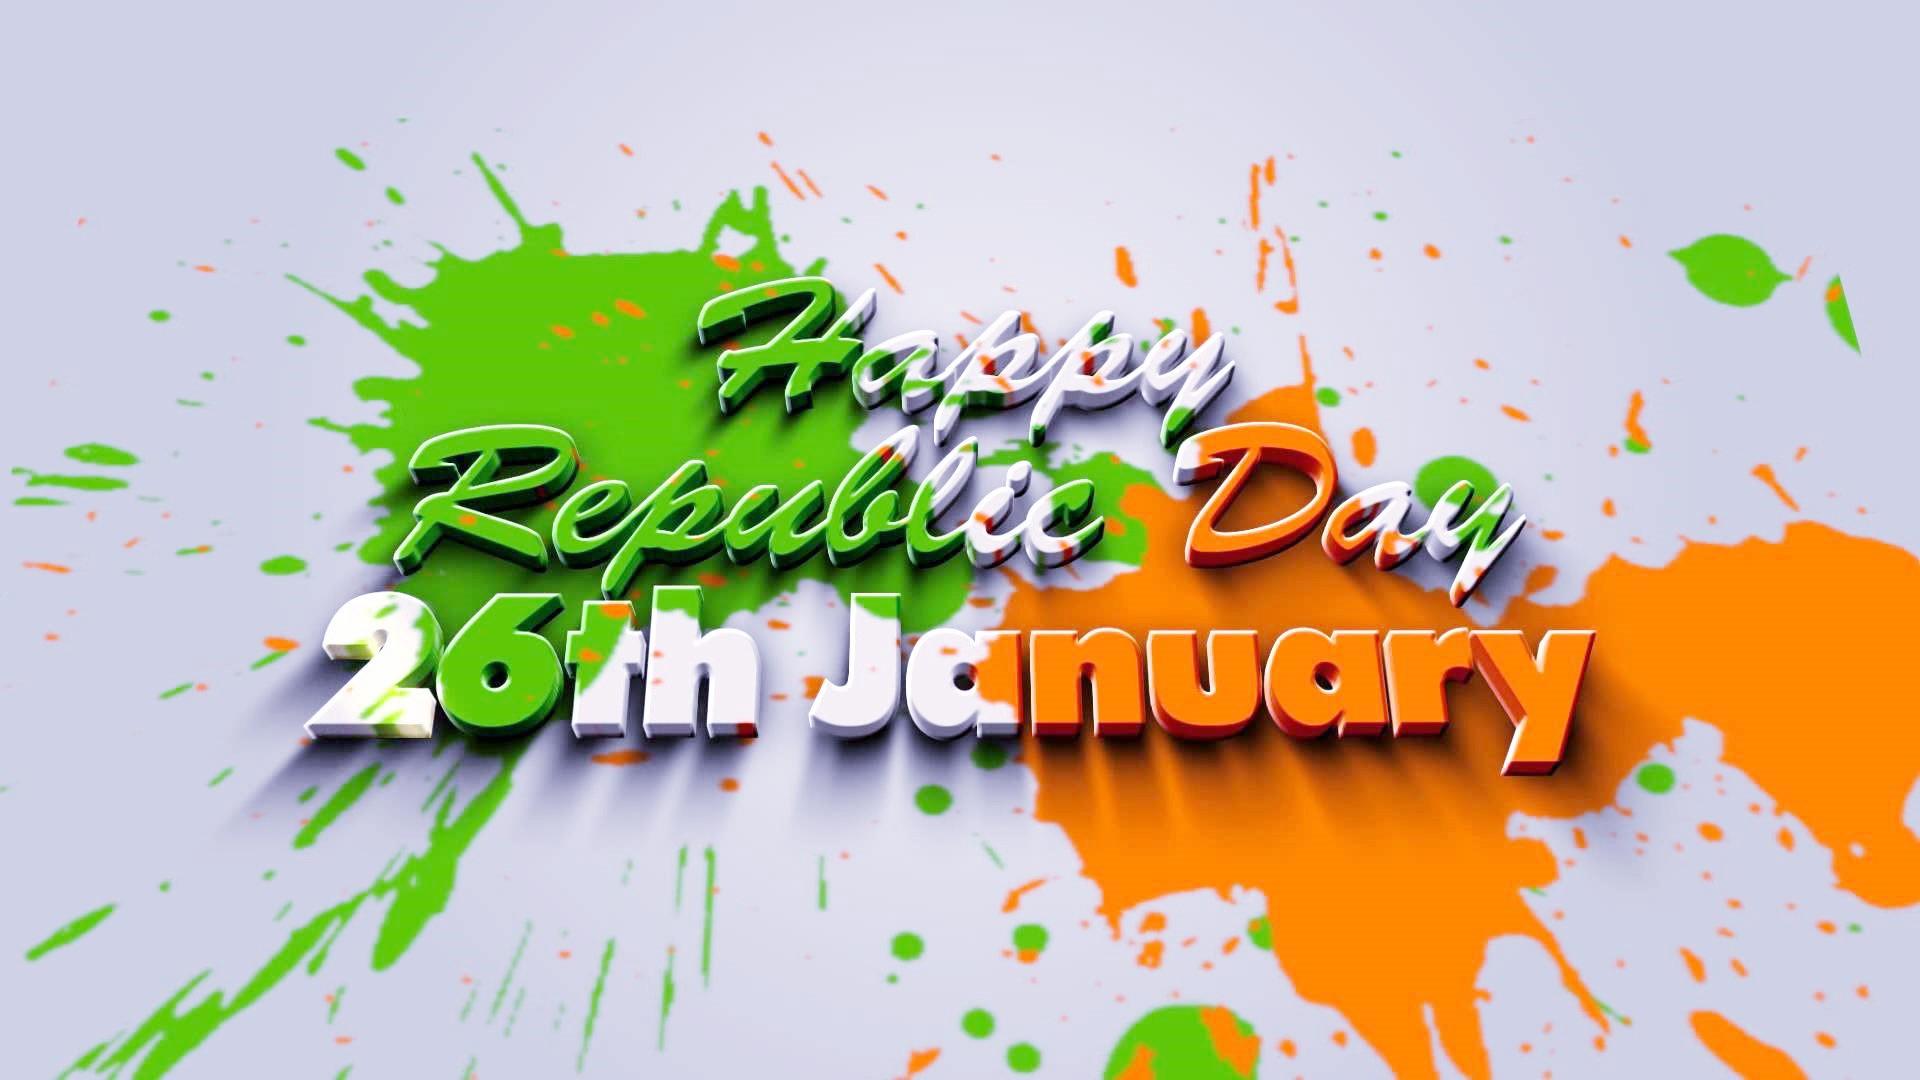 Republic Day 2020 Hd Wallpaper For Facebook